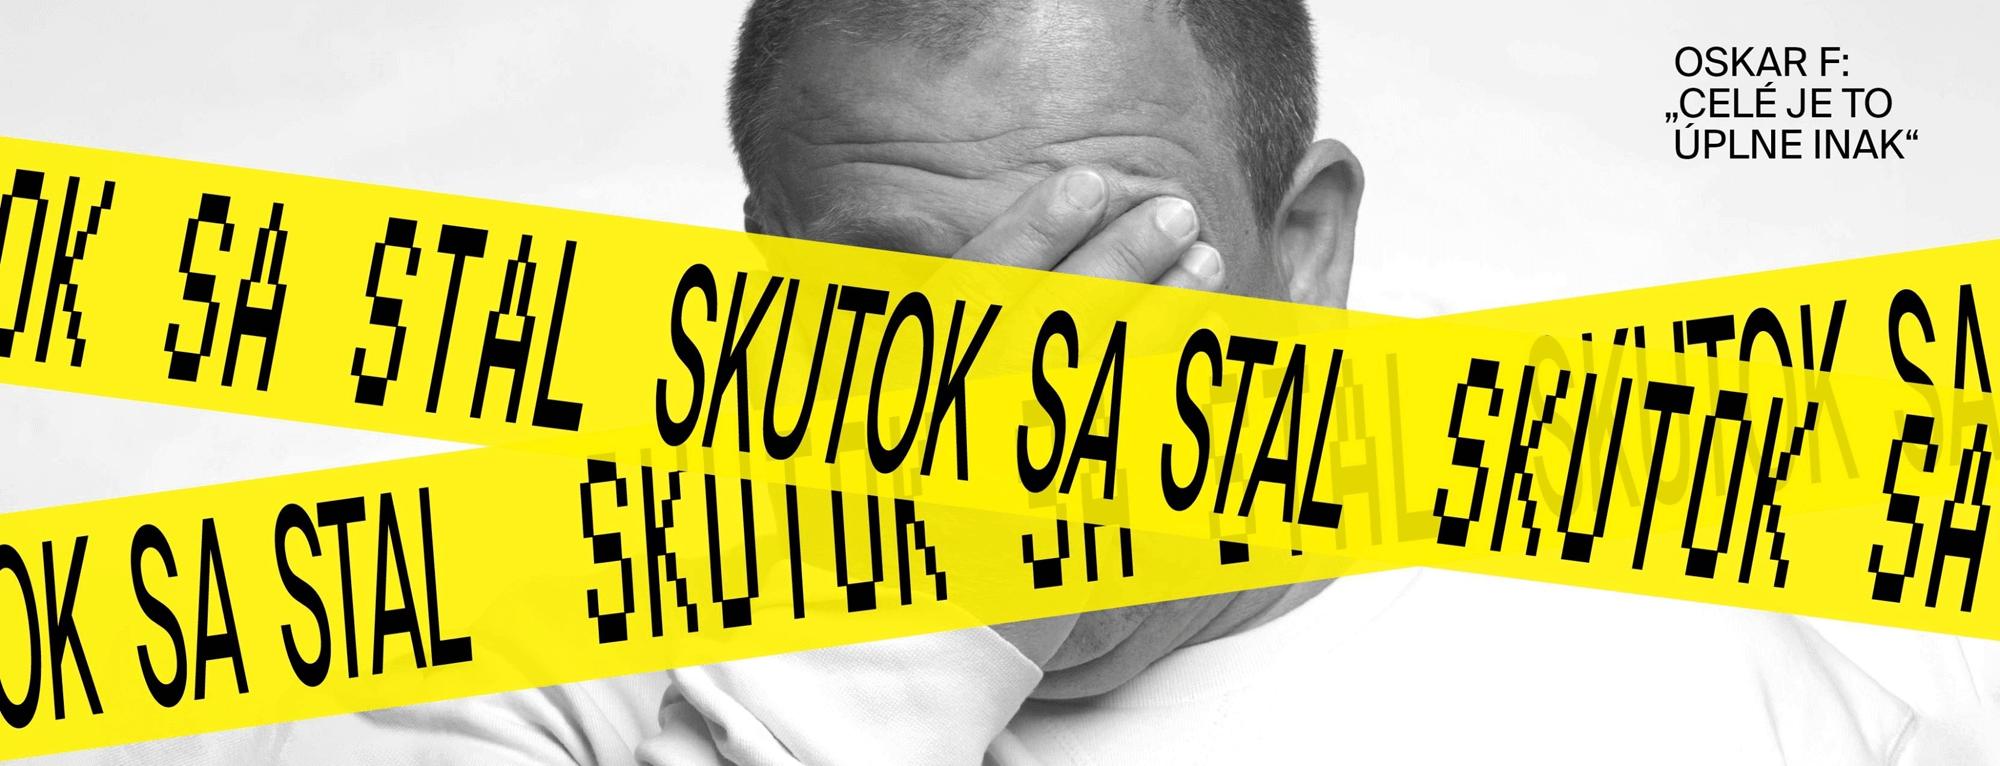 klient-wooacademy-skutok-sa-stal-logo